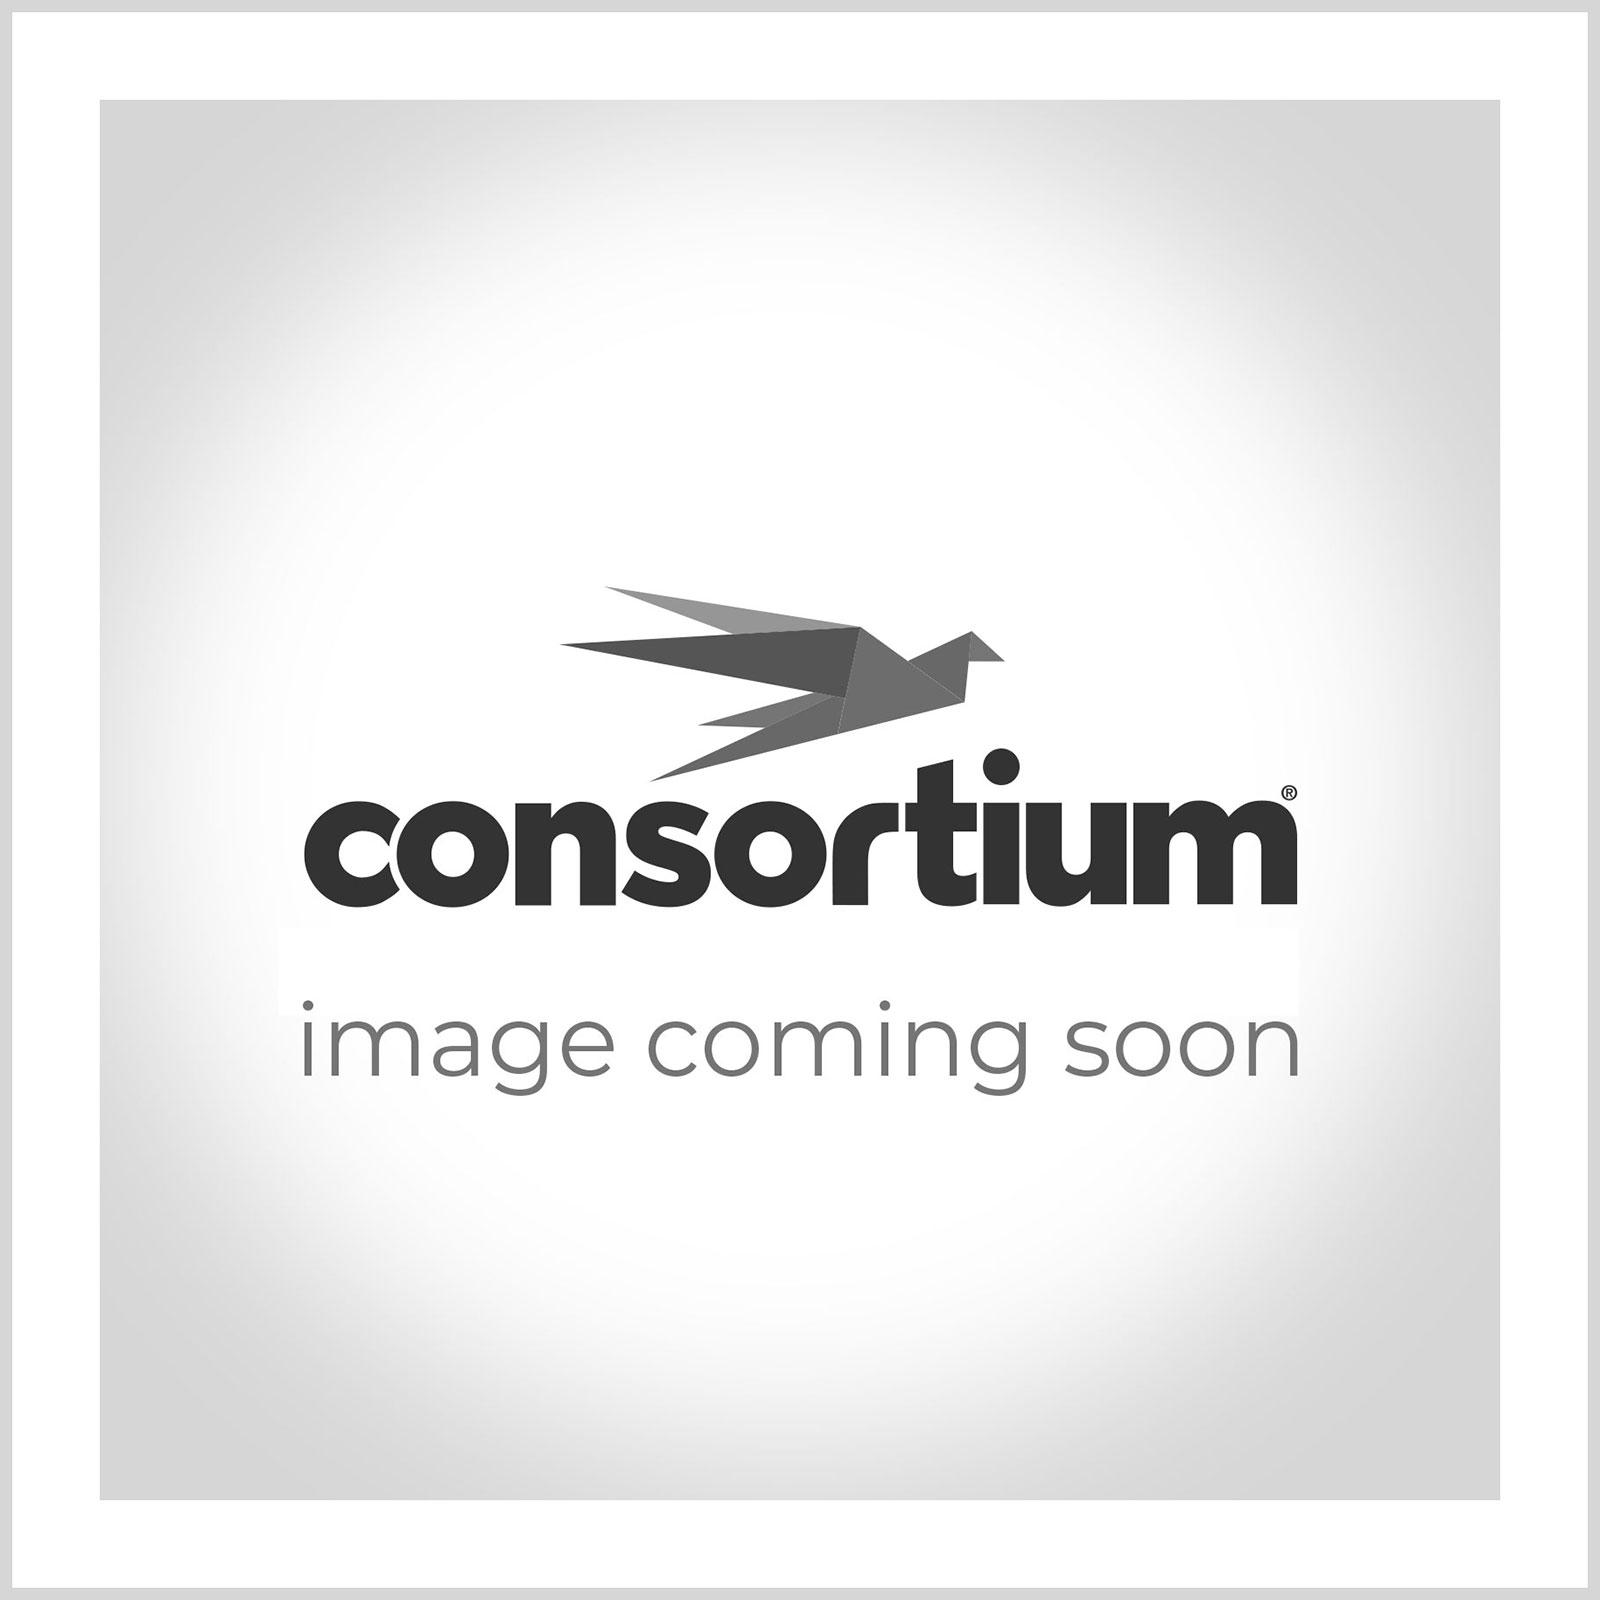 Consortium Luxury 3 Ply Toilet Rolls